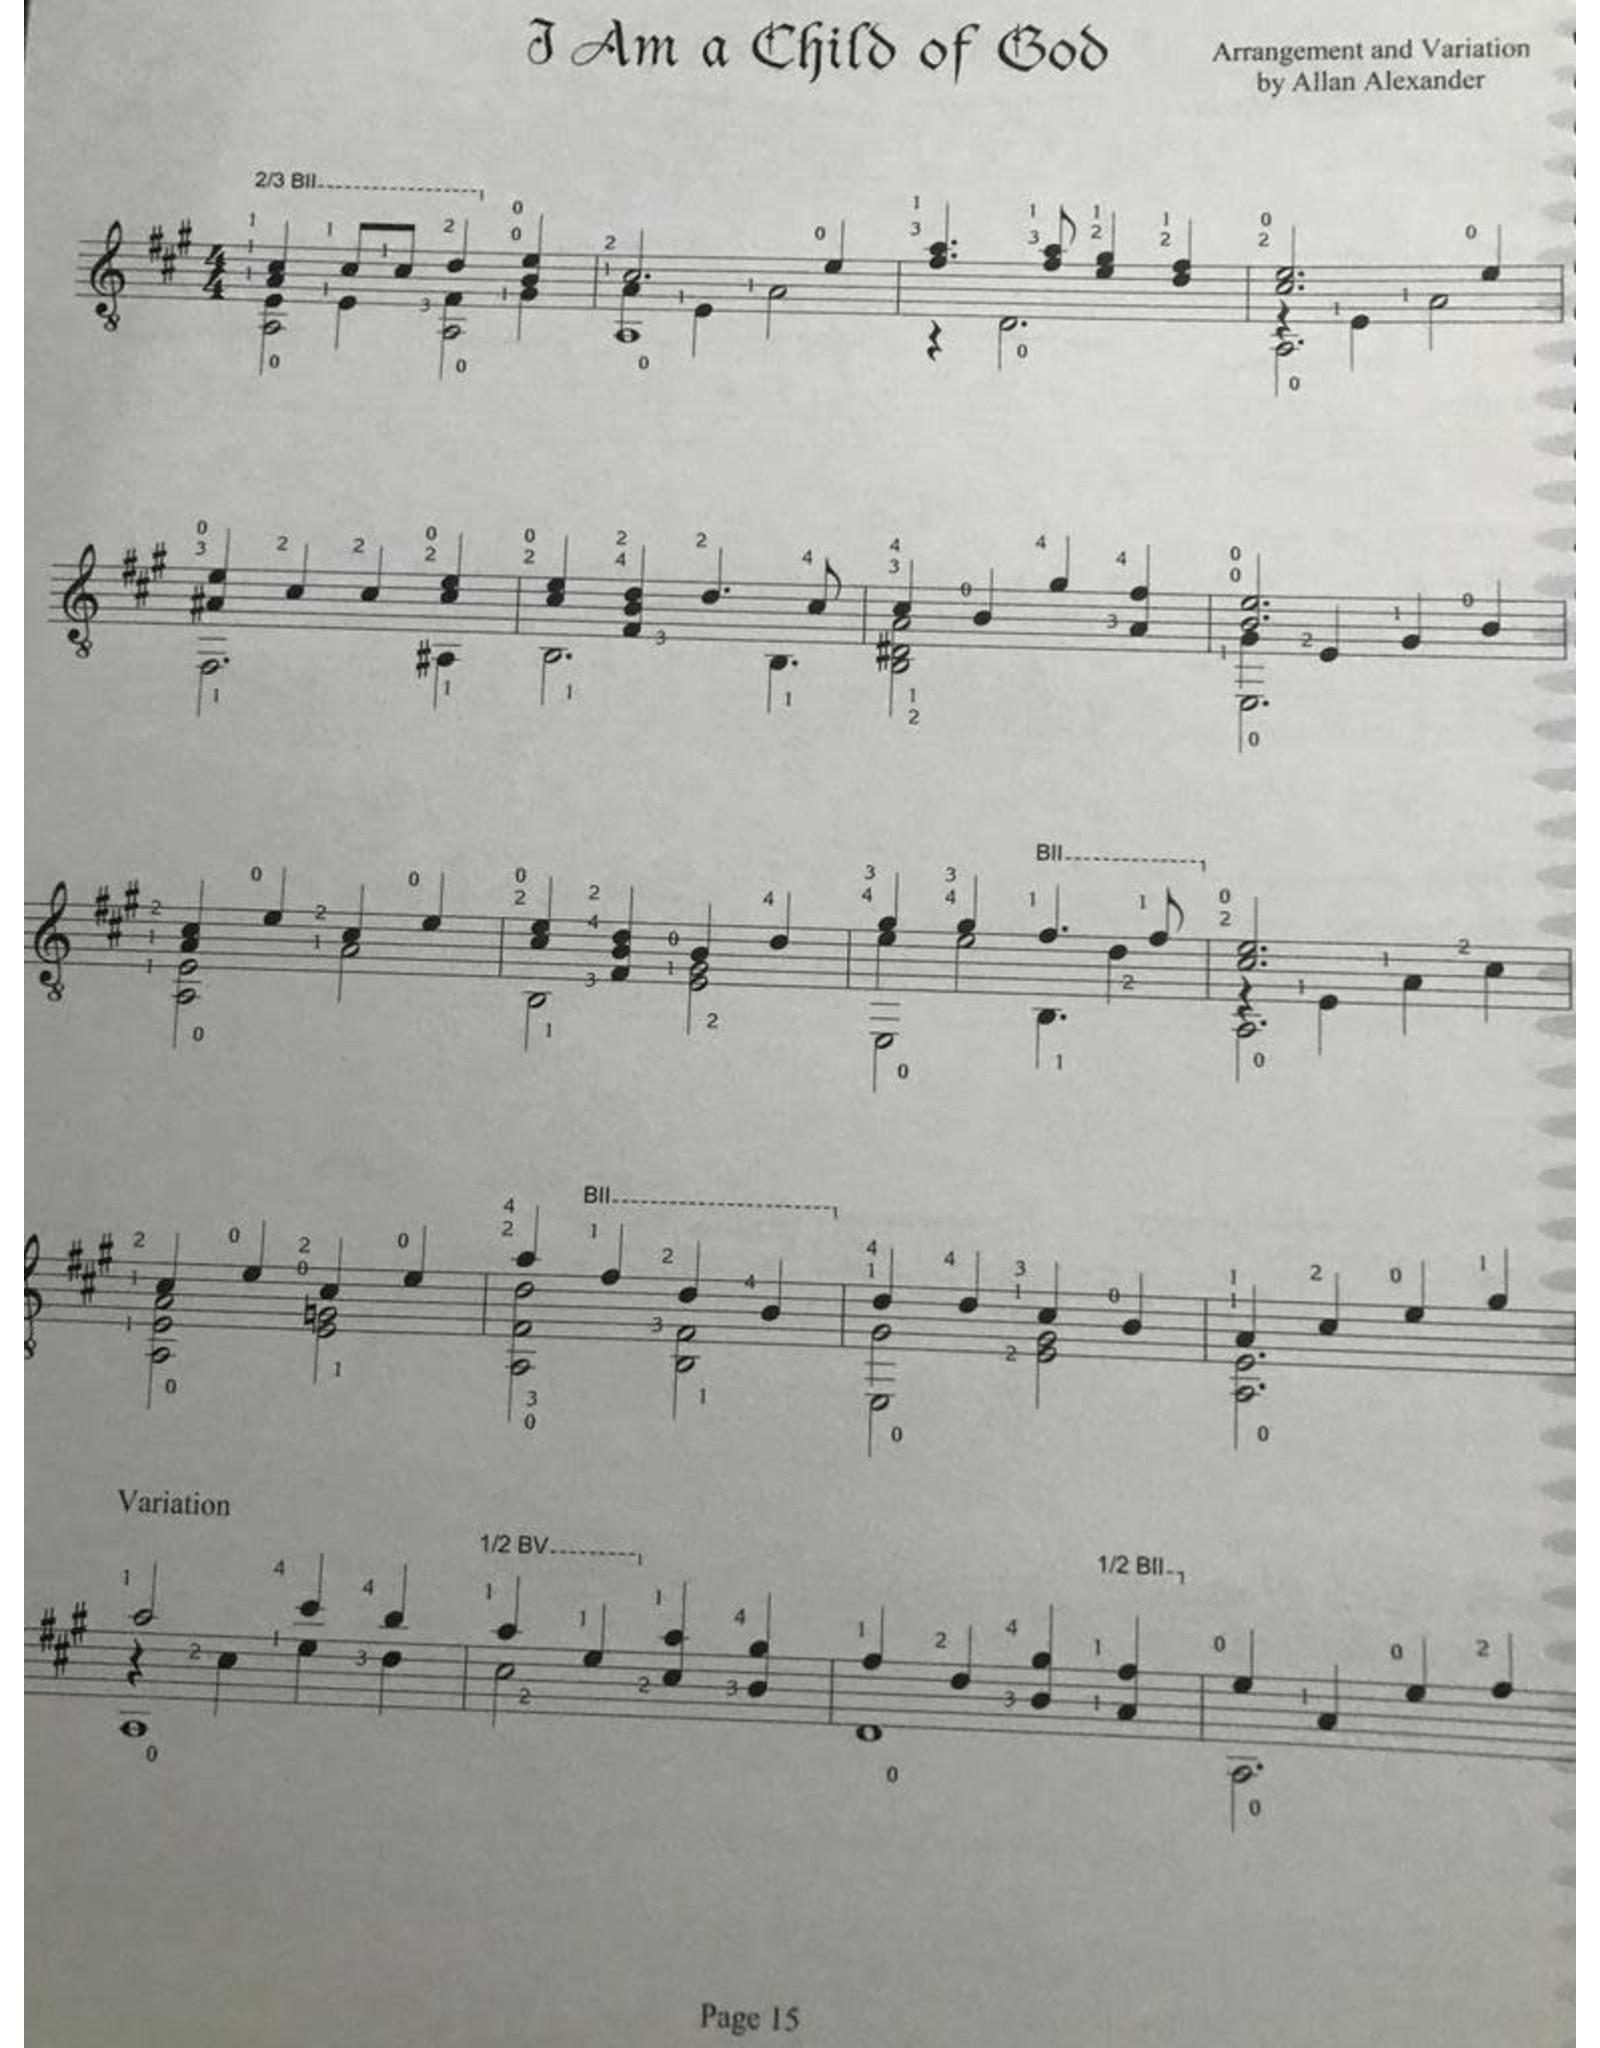 Empath (Mike Erickson) Hymns Plus - Guitar Hymn Book by Allan Alexander and Mike Ericksen